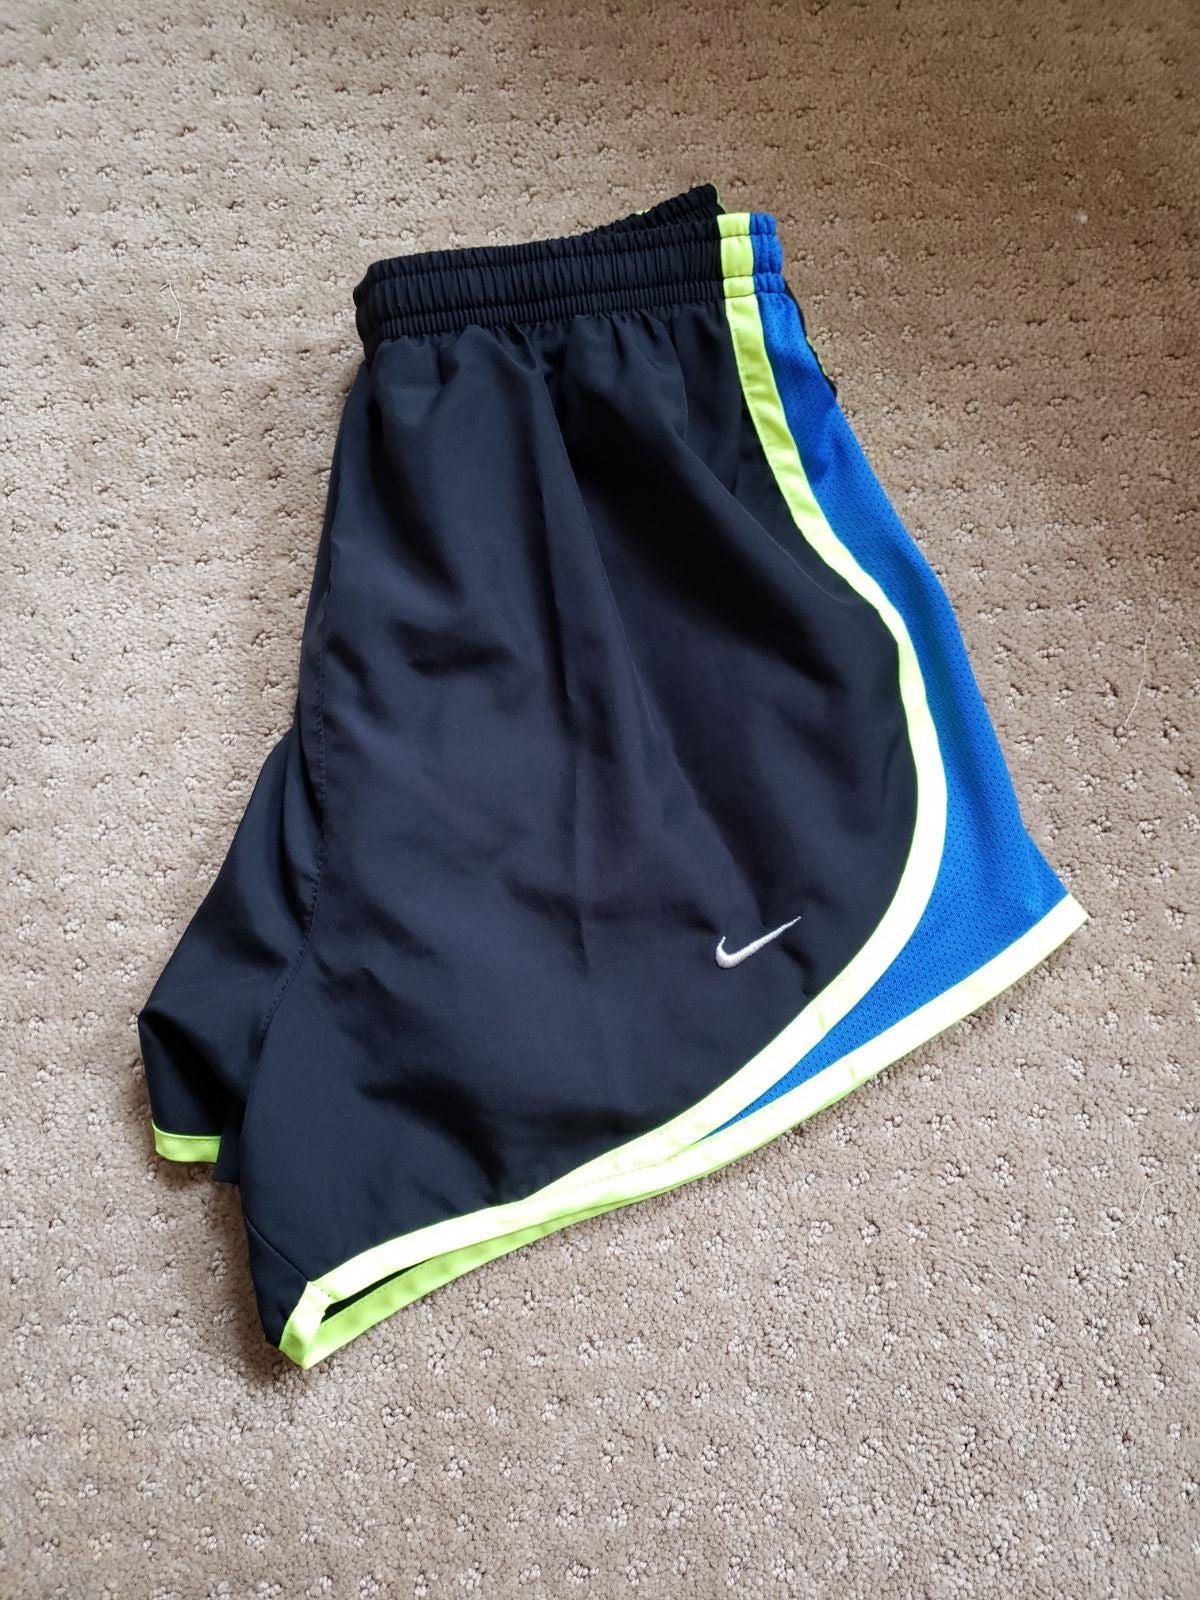 Nike womens running shorts black,blue, a